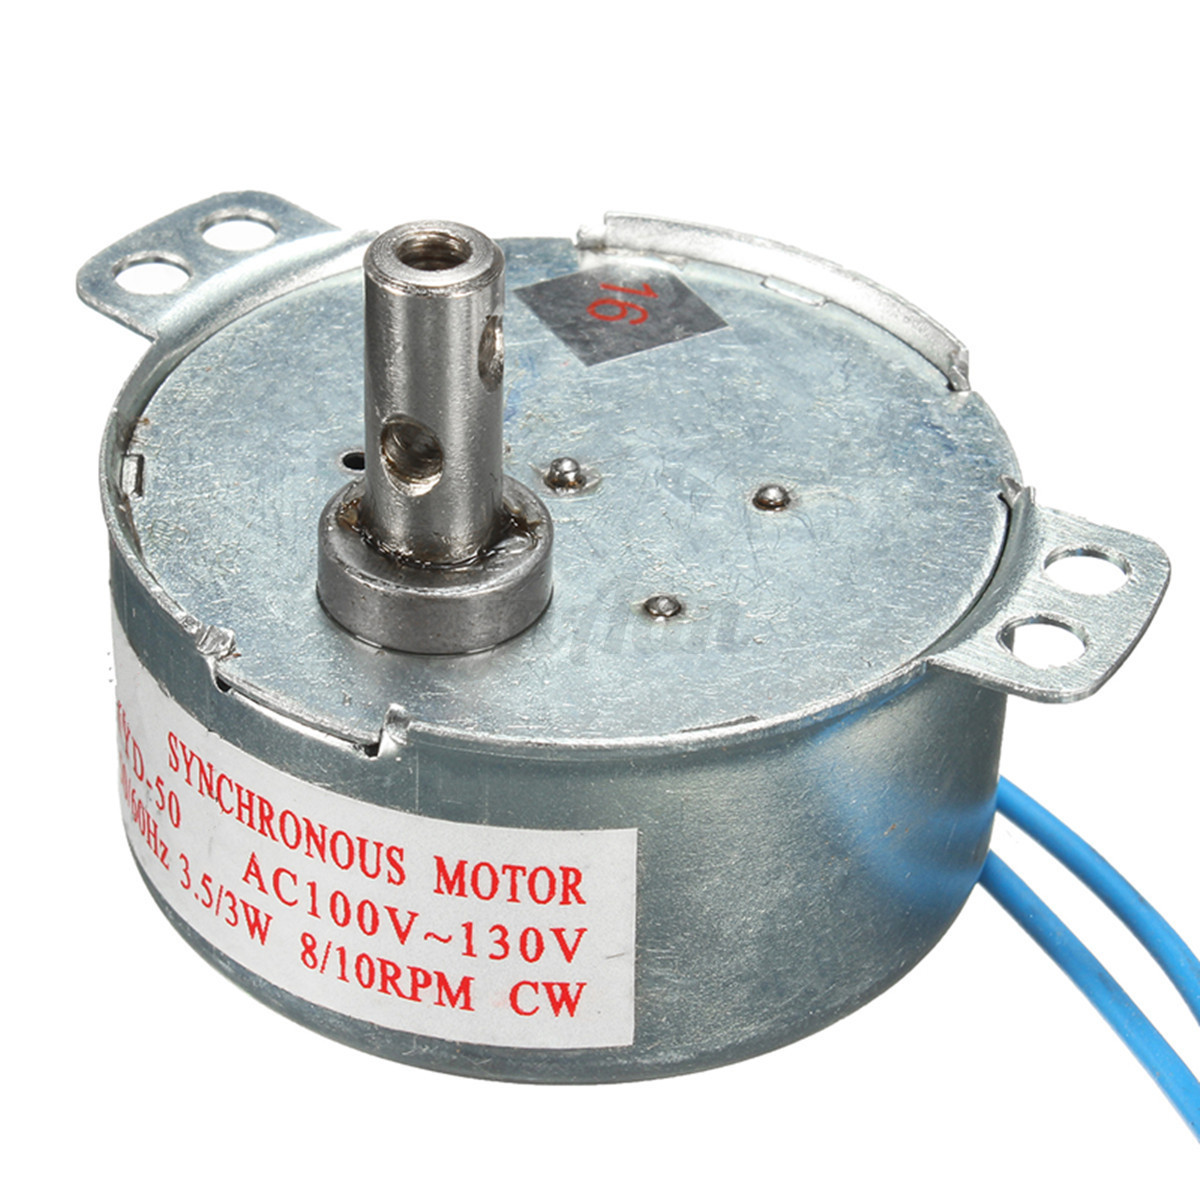 110v Ac 8 10rpm Cw Ccw Tyd 50 3w Synchronous Motor Low Noise Robust Torque Motor Ebay